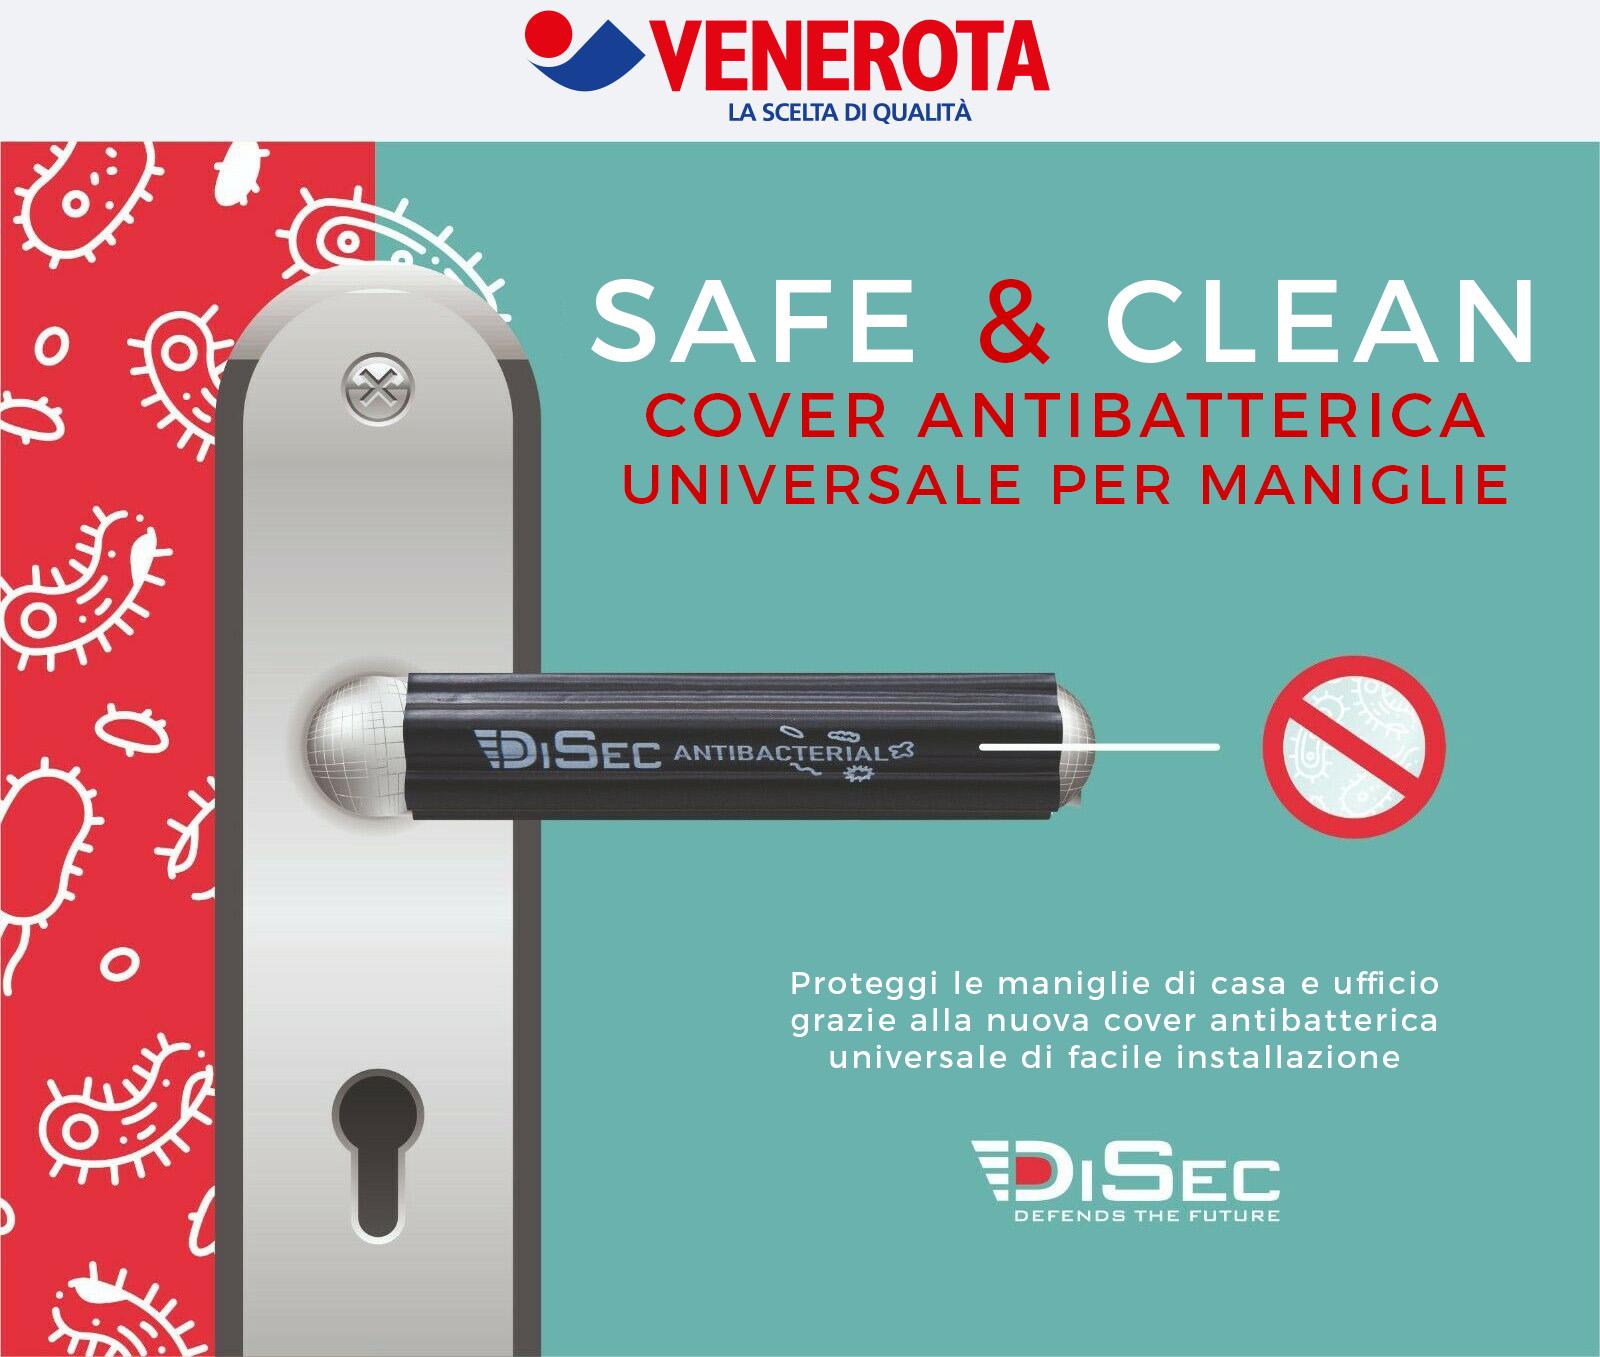 DISEC cover maniglia antibatterica